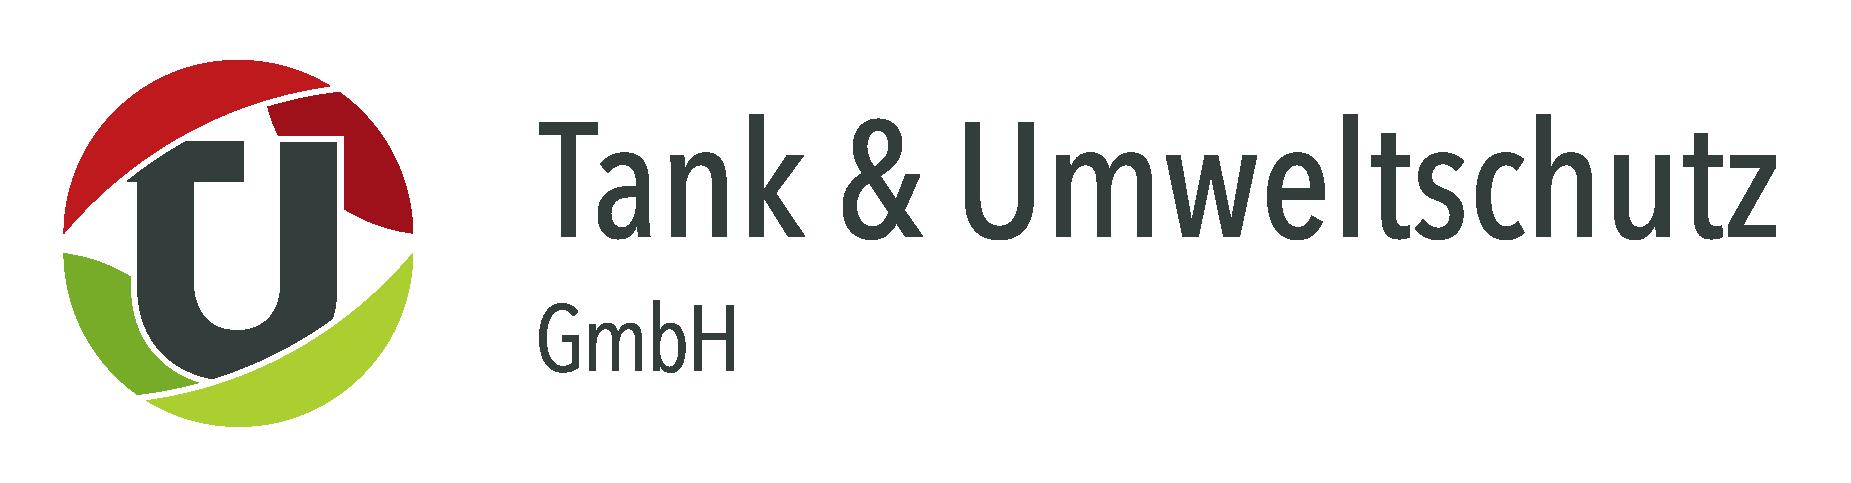 Tank & Umweltschutz